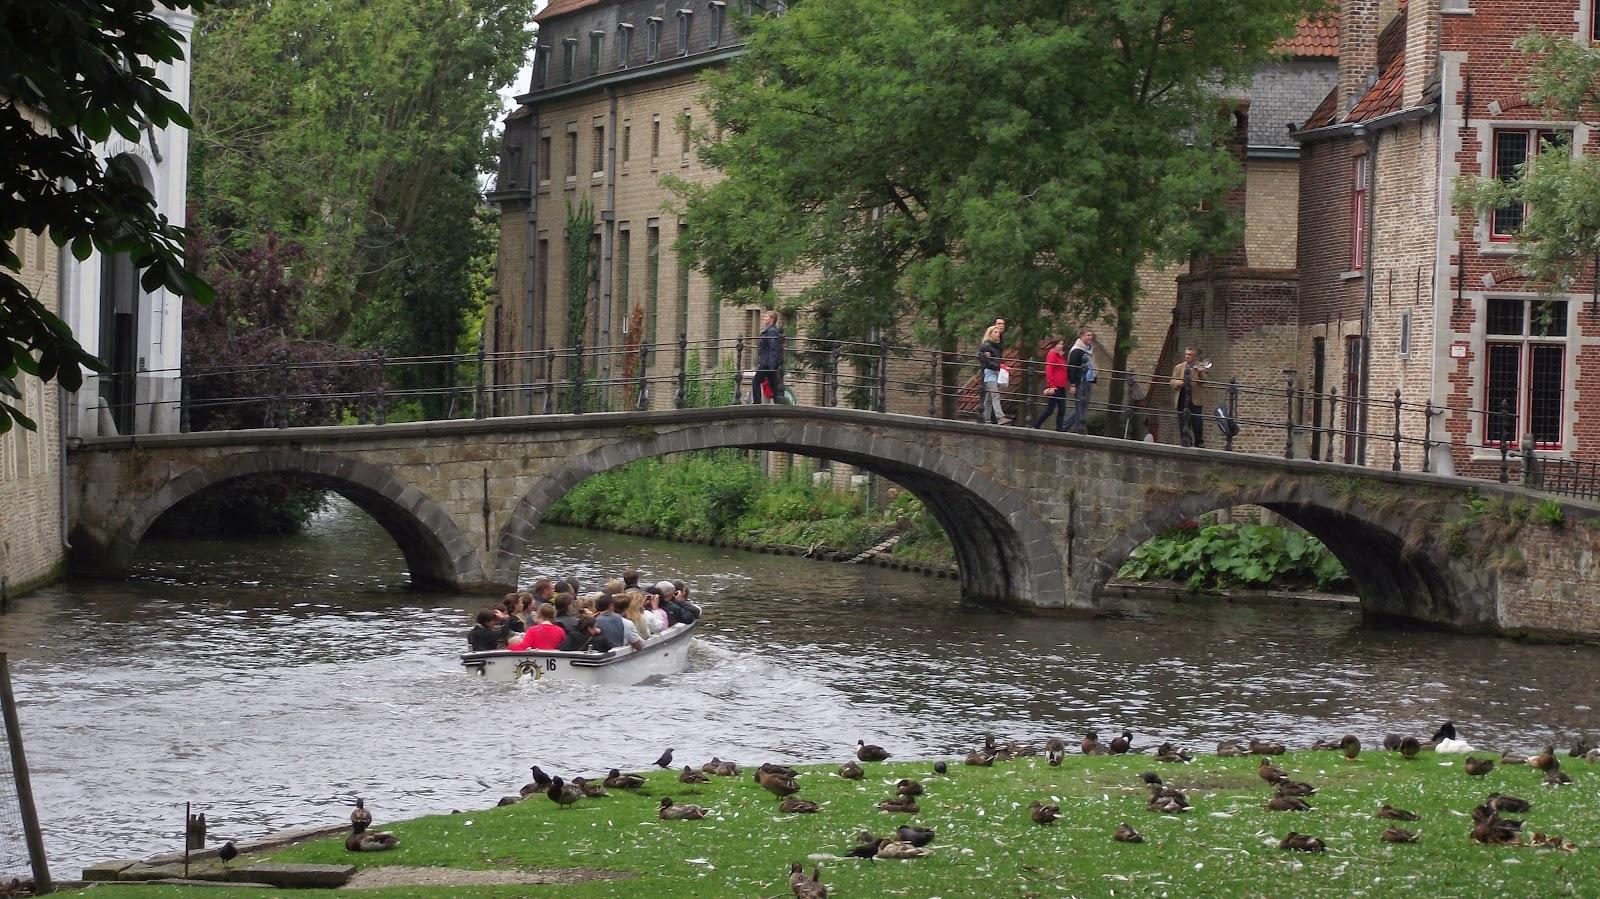 http://perdidos-em-eindhoven.blogspot.nl/2012/05/carcassonne-sul-da-franca.html